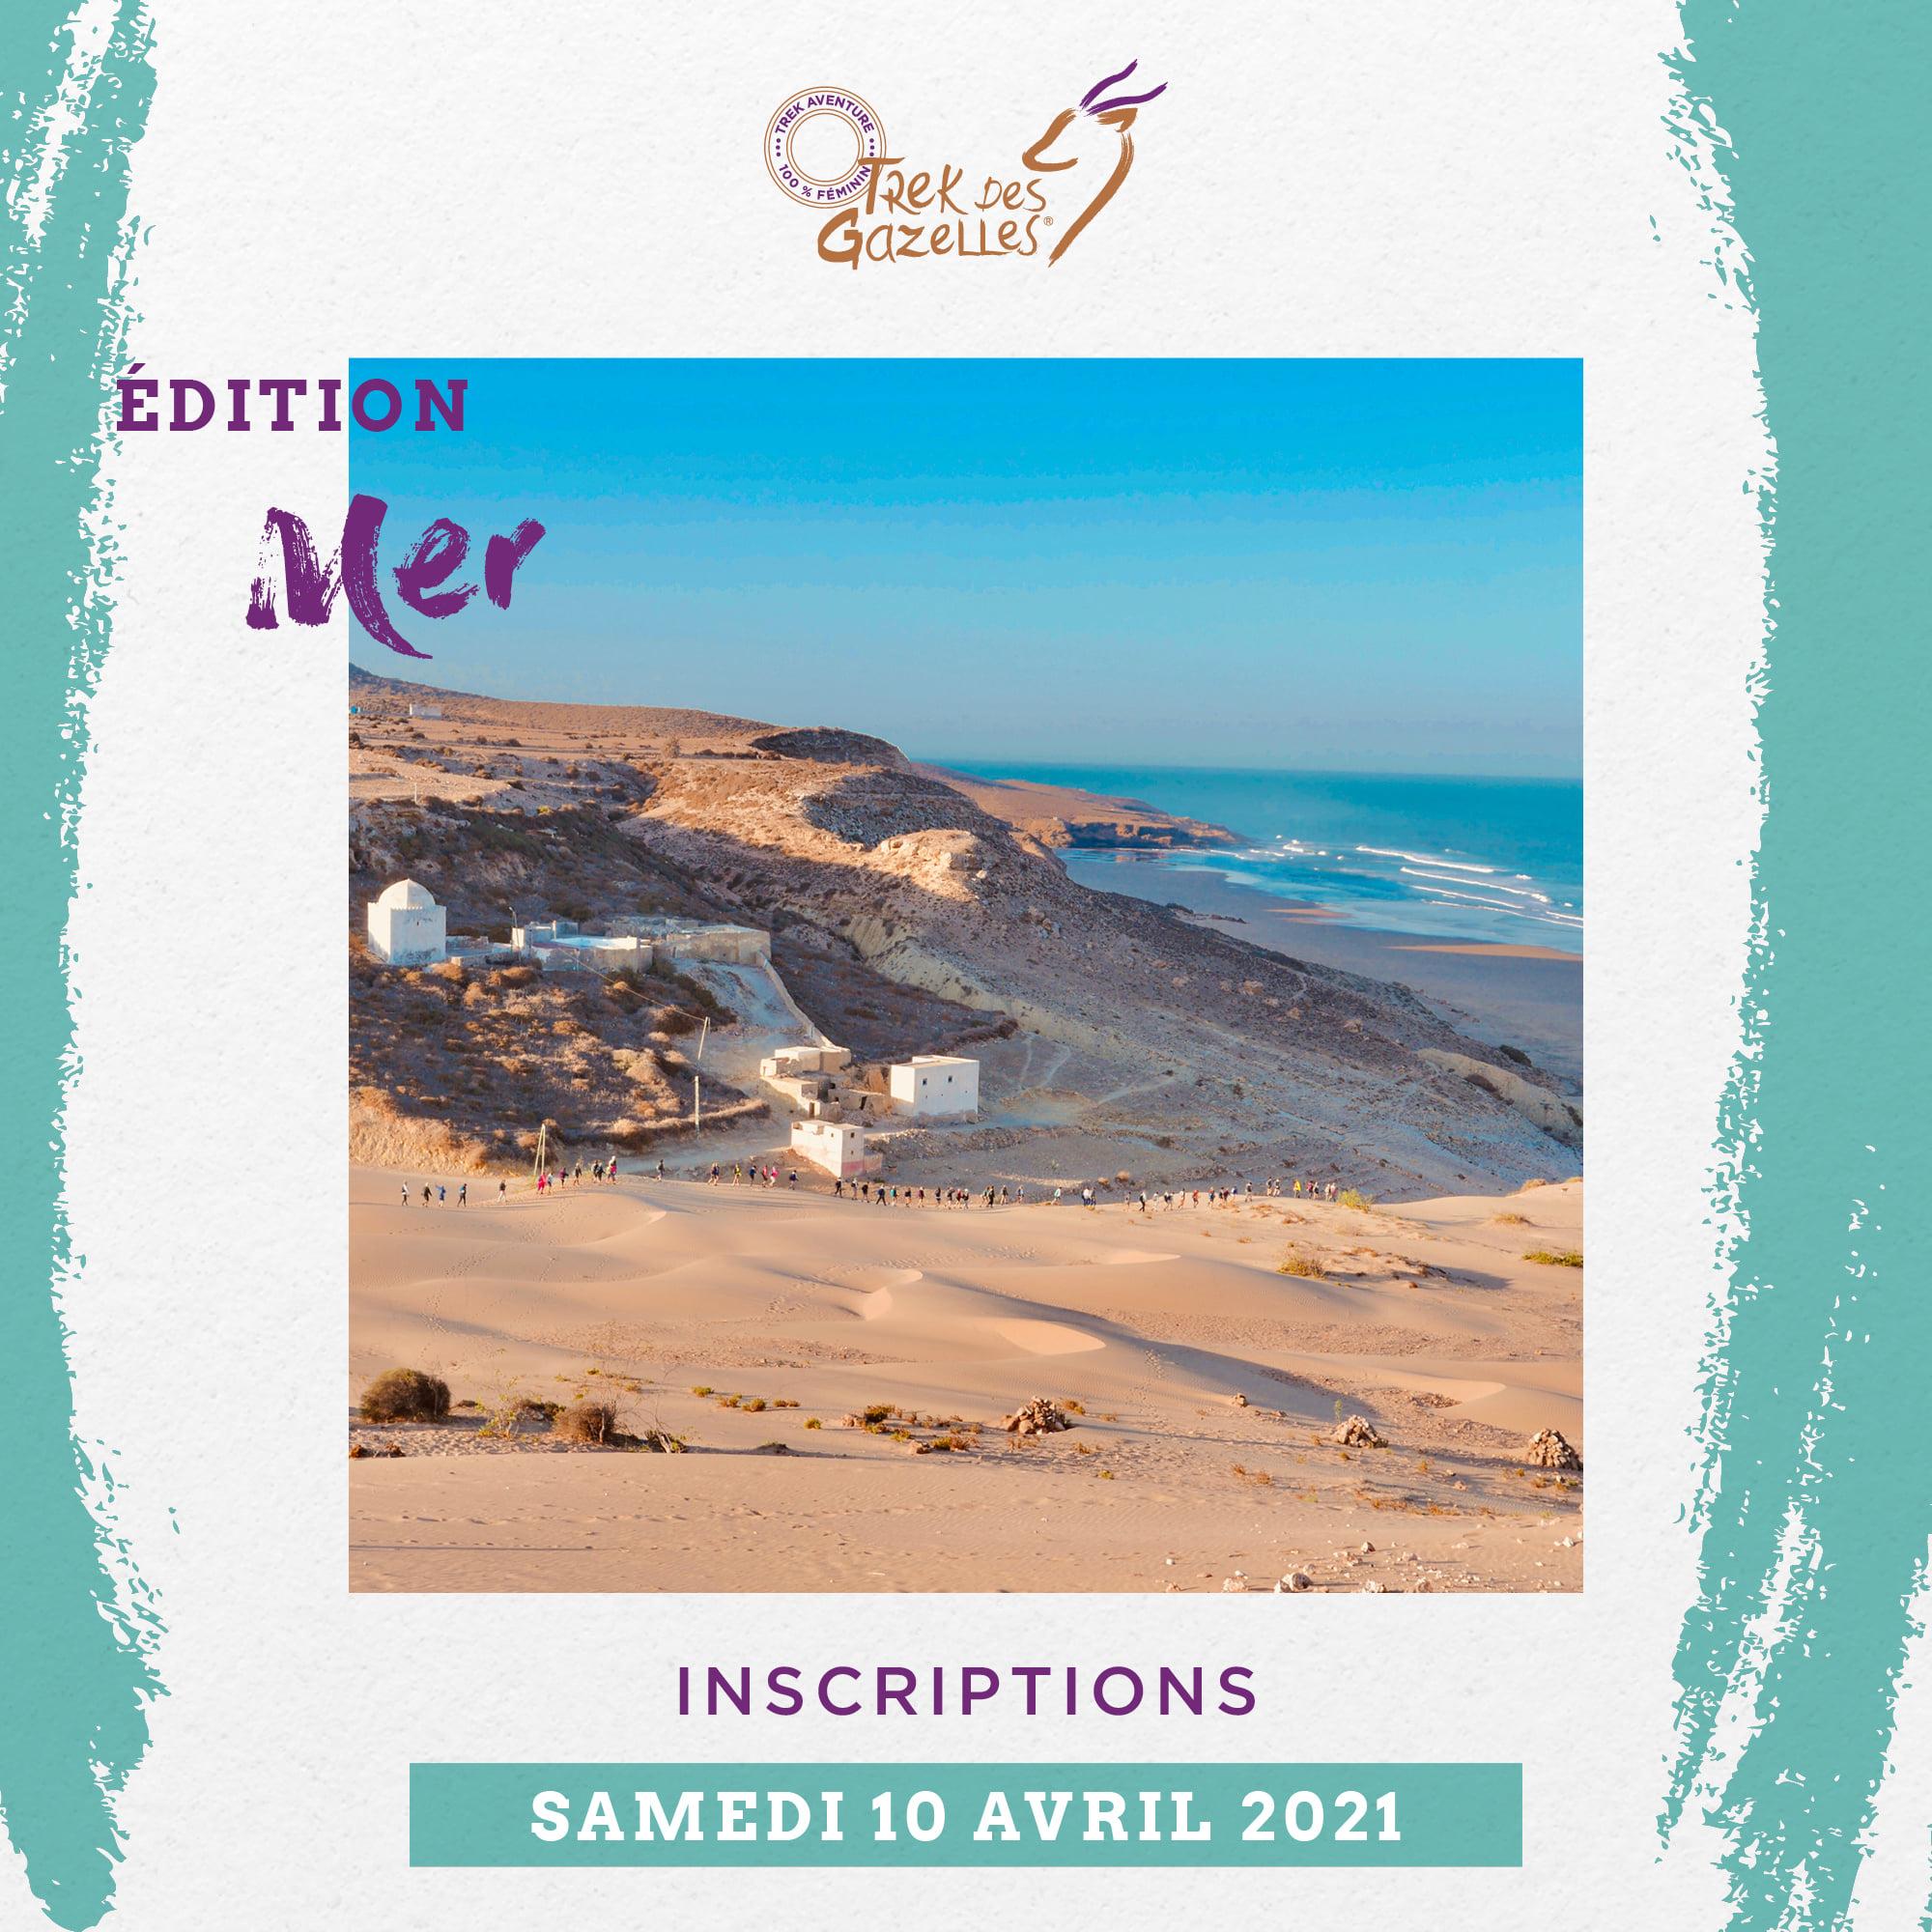 edition-mer